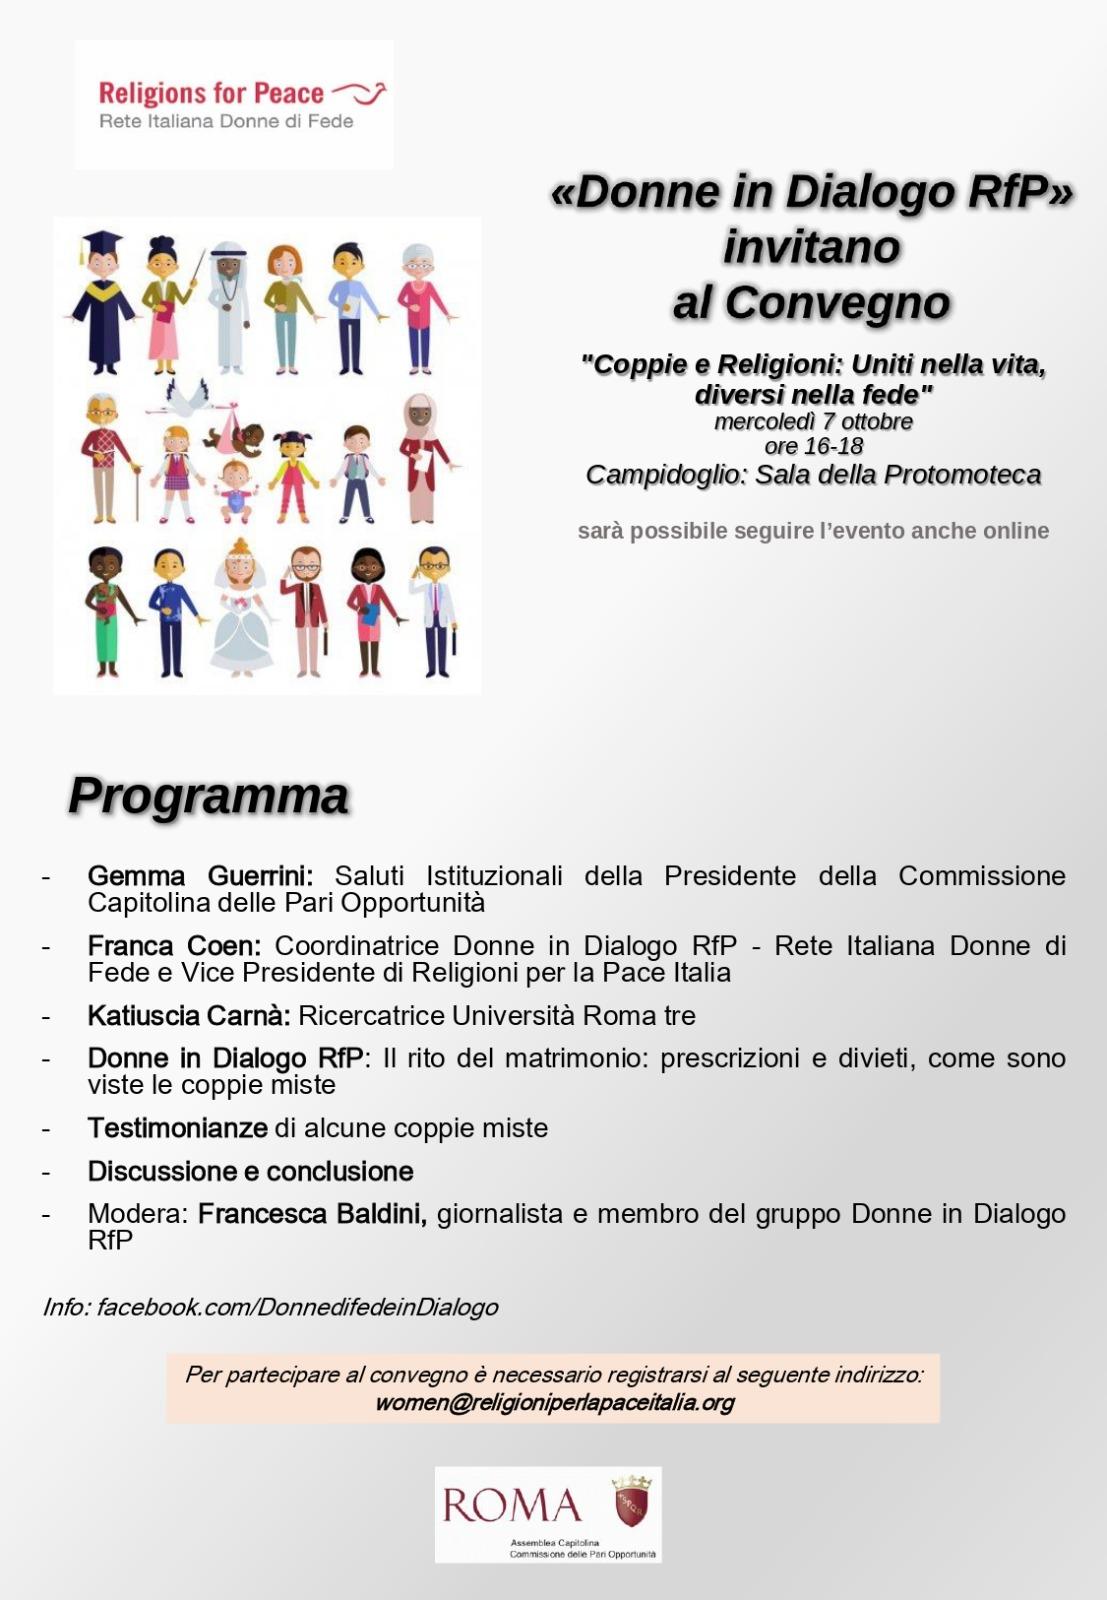 07.10.2020, ROMA: Donne in Dialogo RfP - Convegno